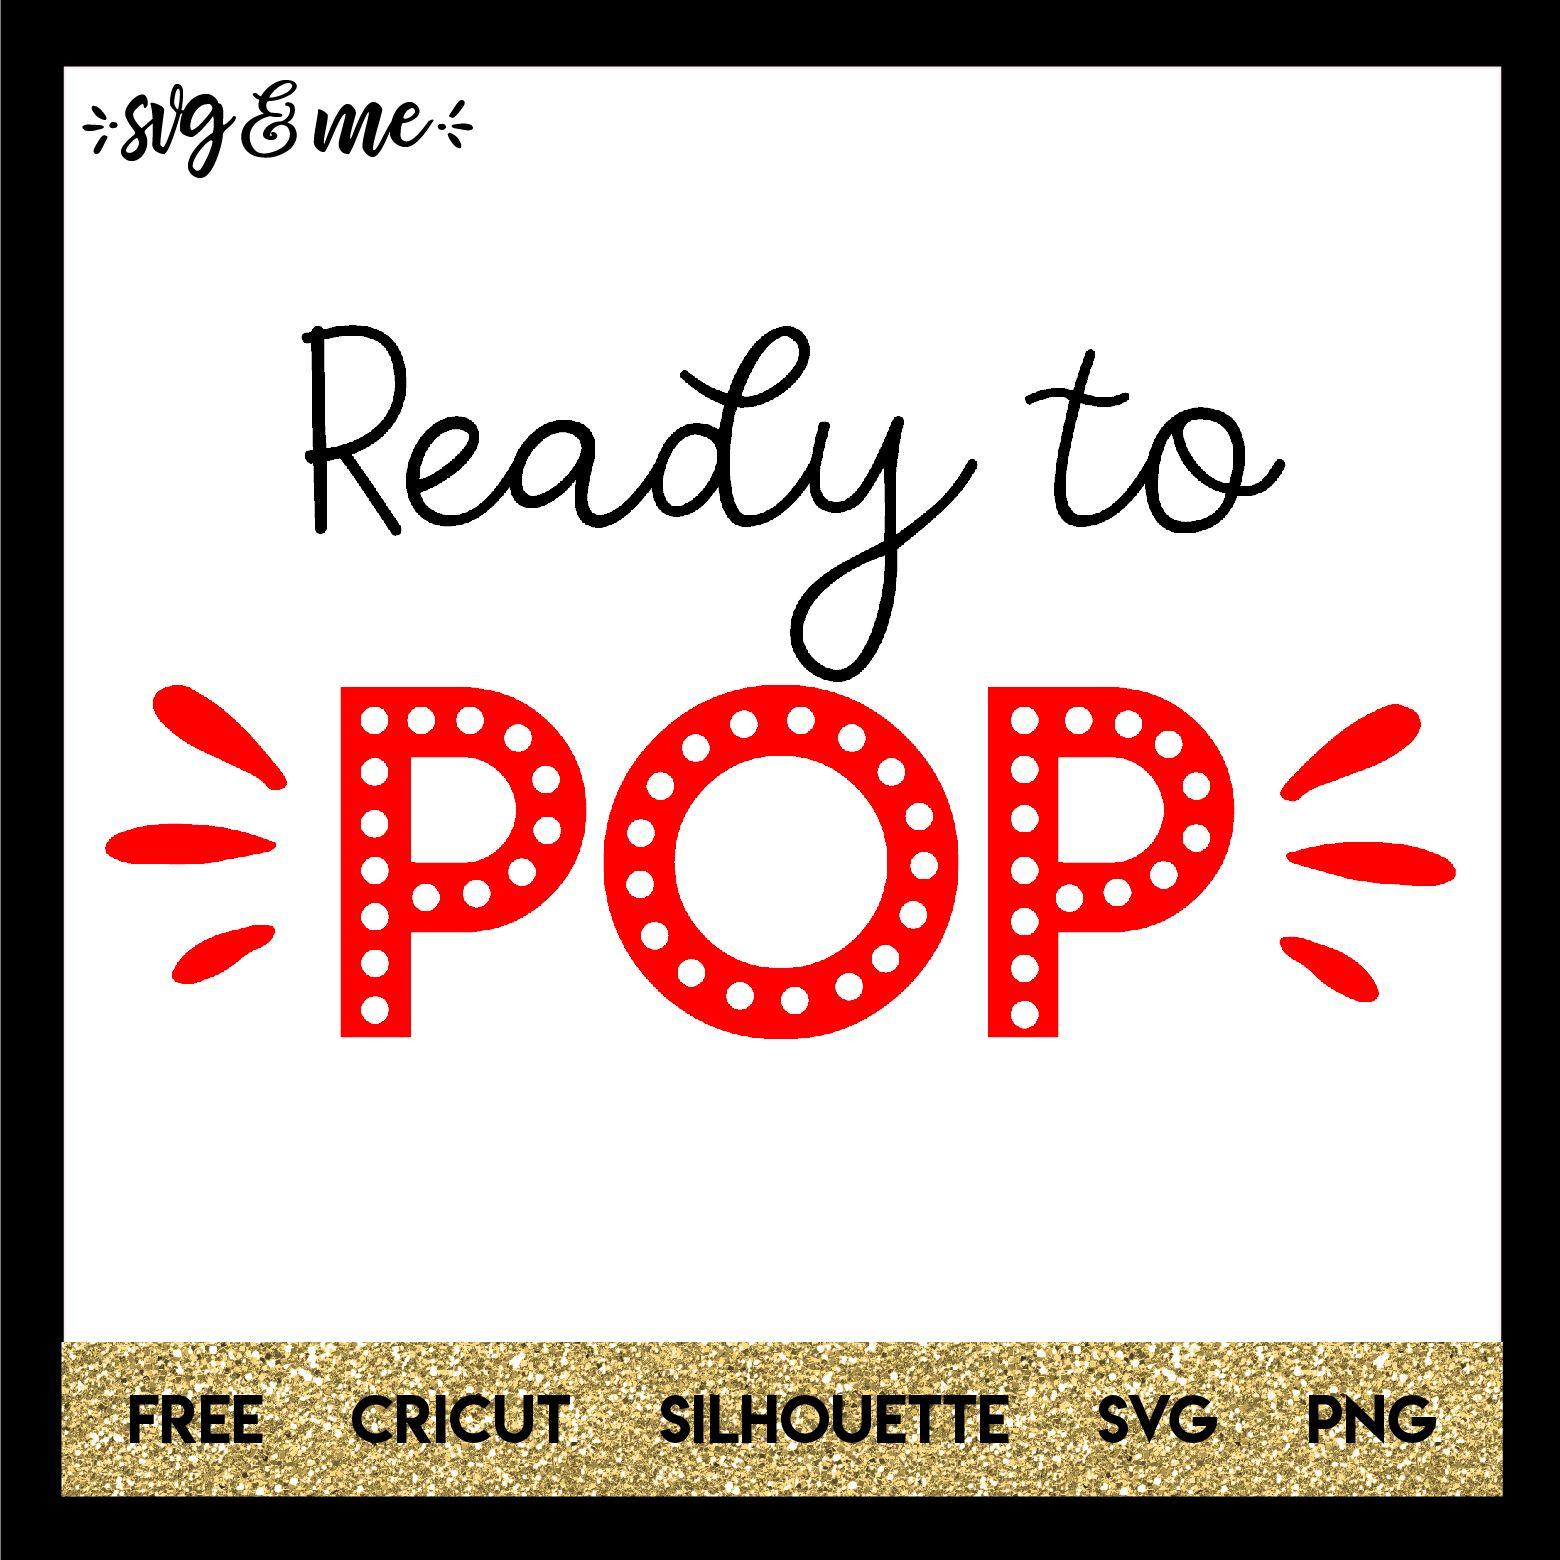 Ready to Pop Ready to pop, Svg, Cricut free